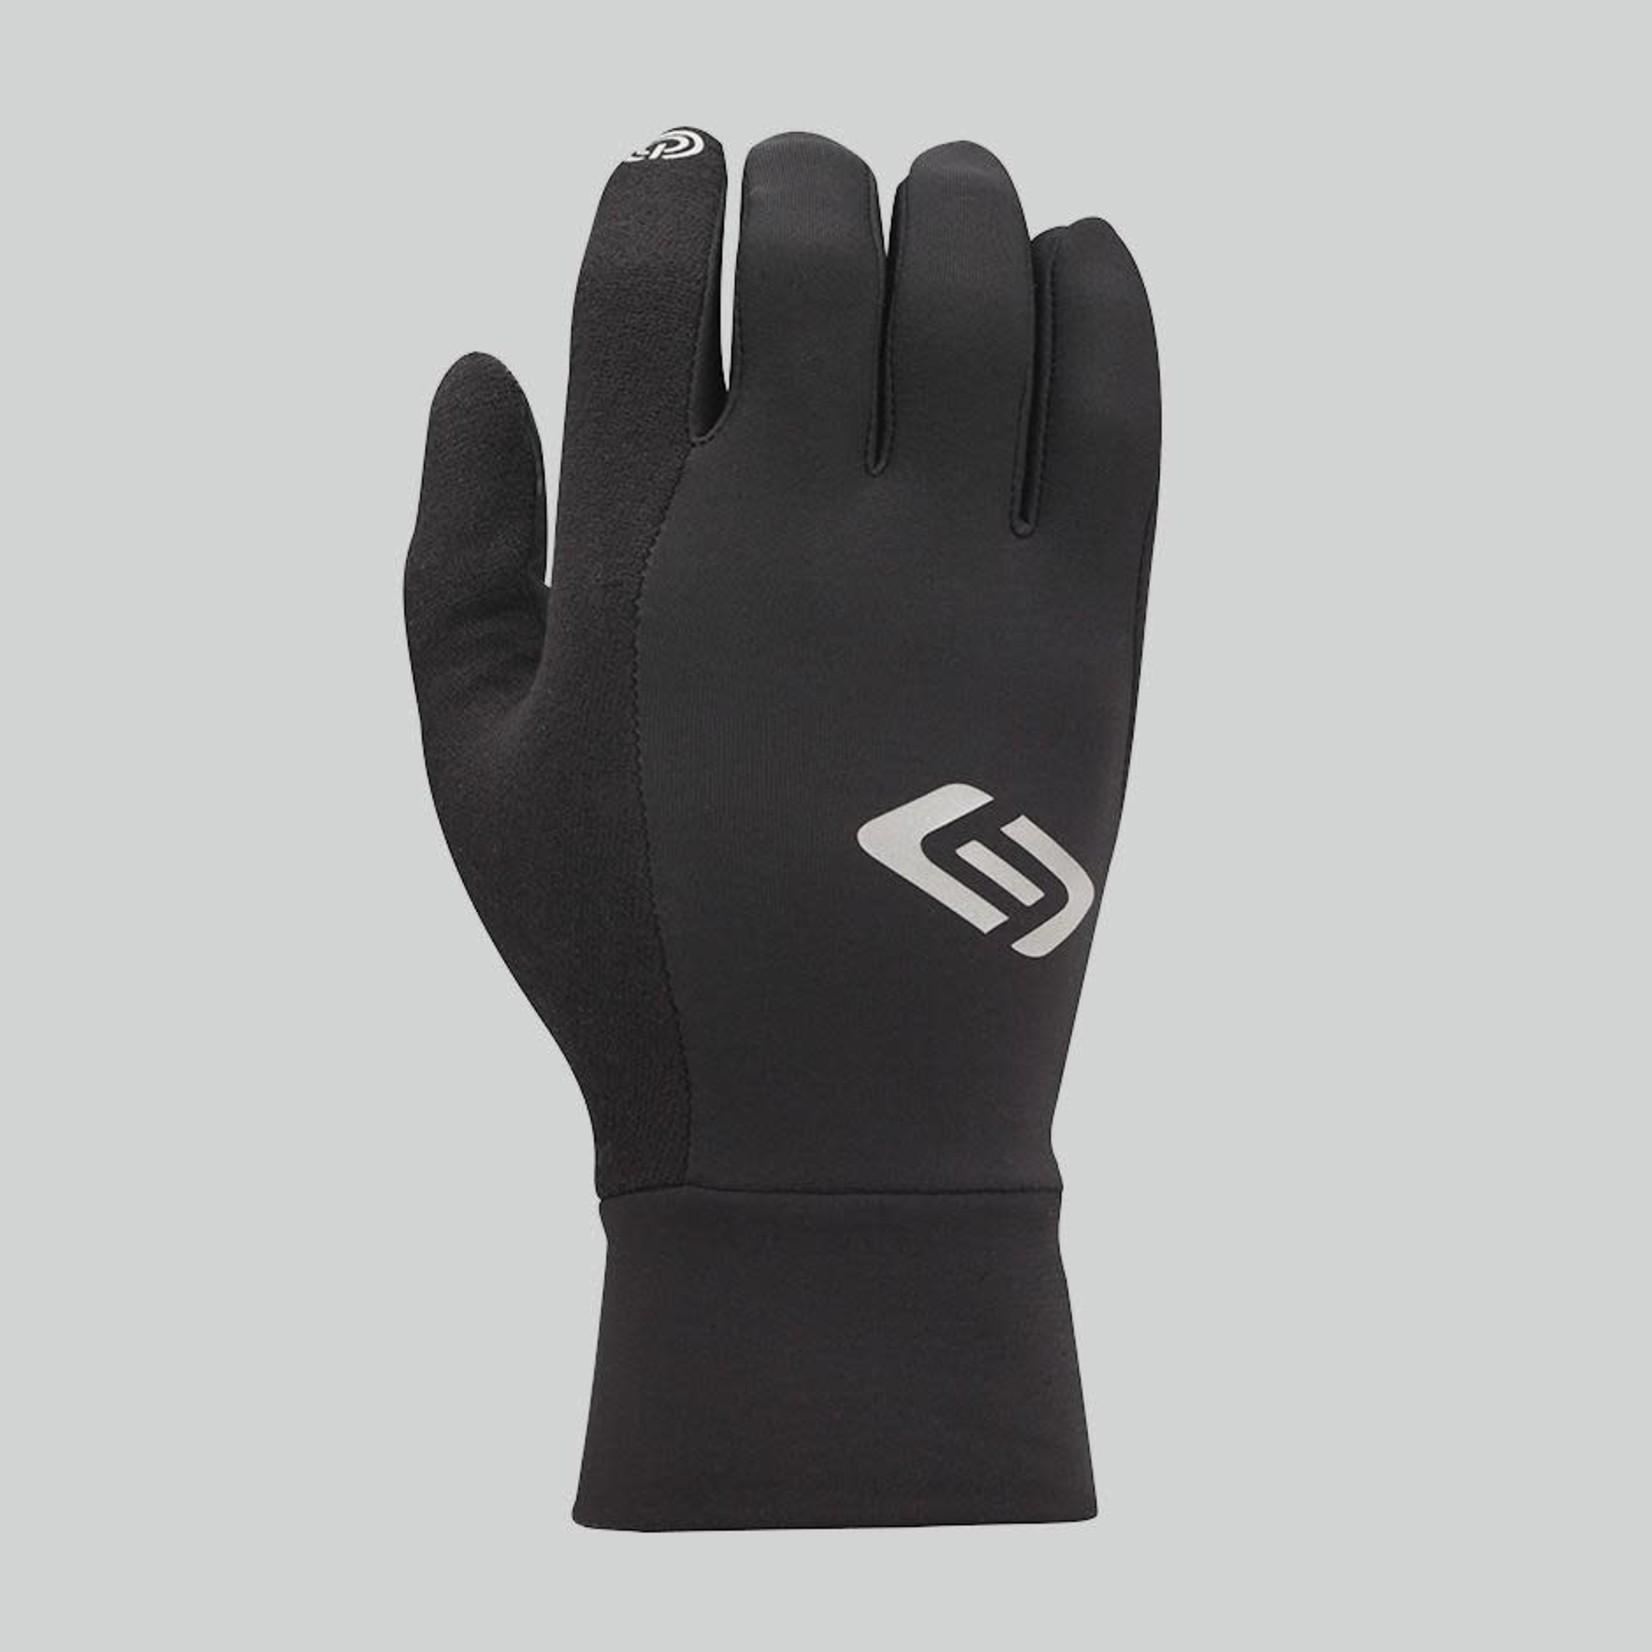 Bellwether Climate Control Gloves - Black - Large